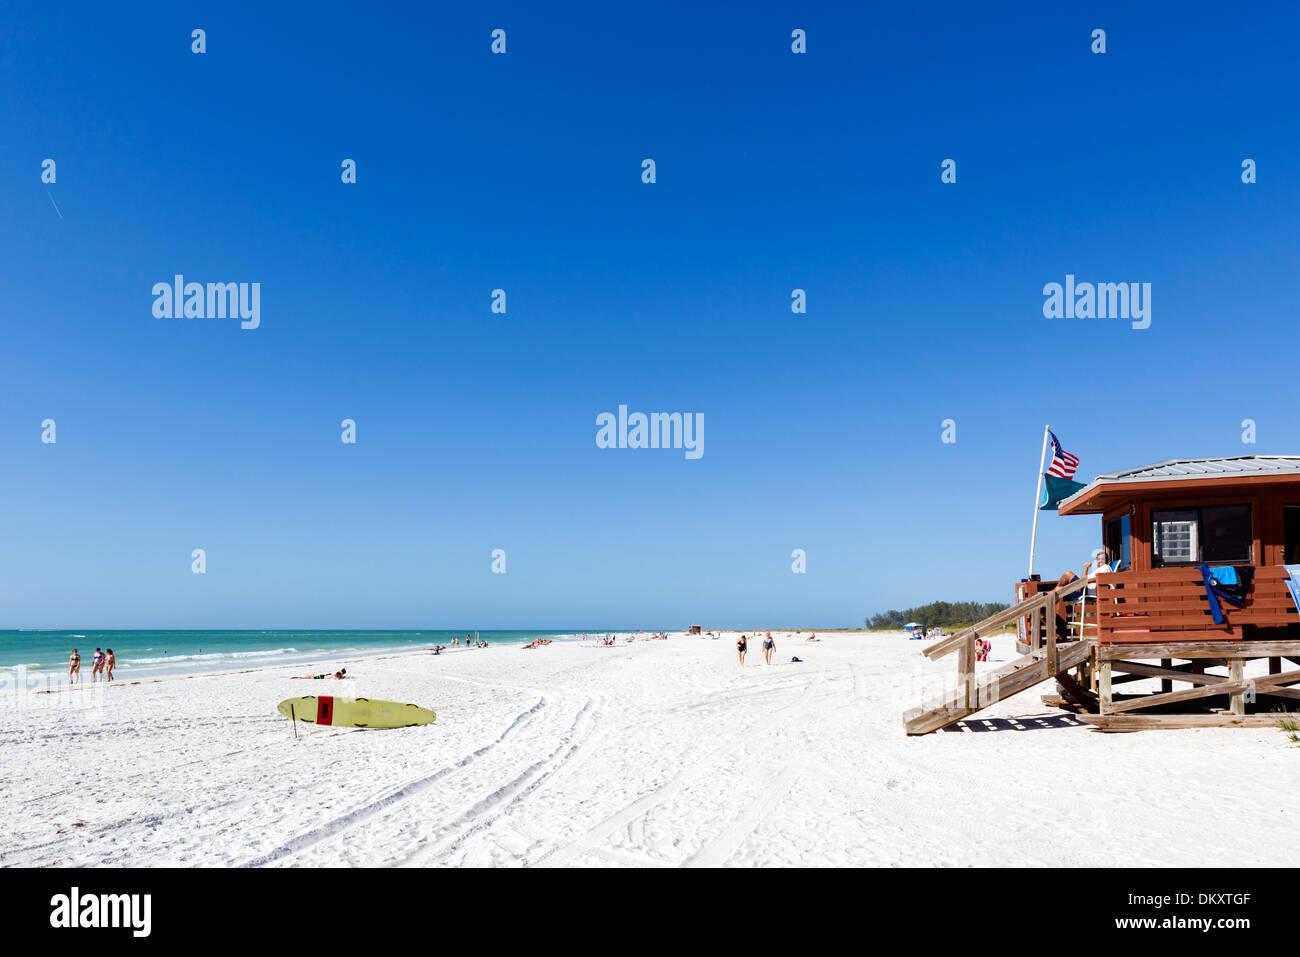 Lido Beach, Sarasota, Gulf Coast, Florida, USA - Stock Image